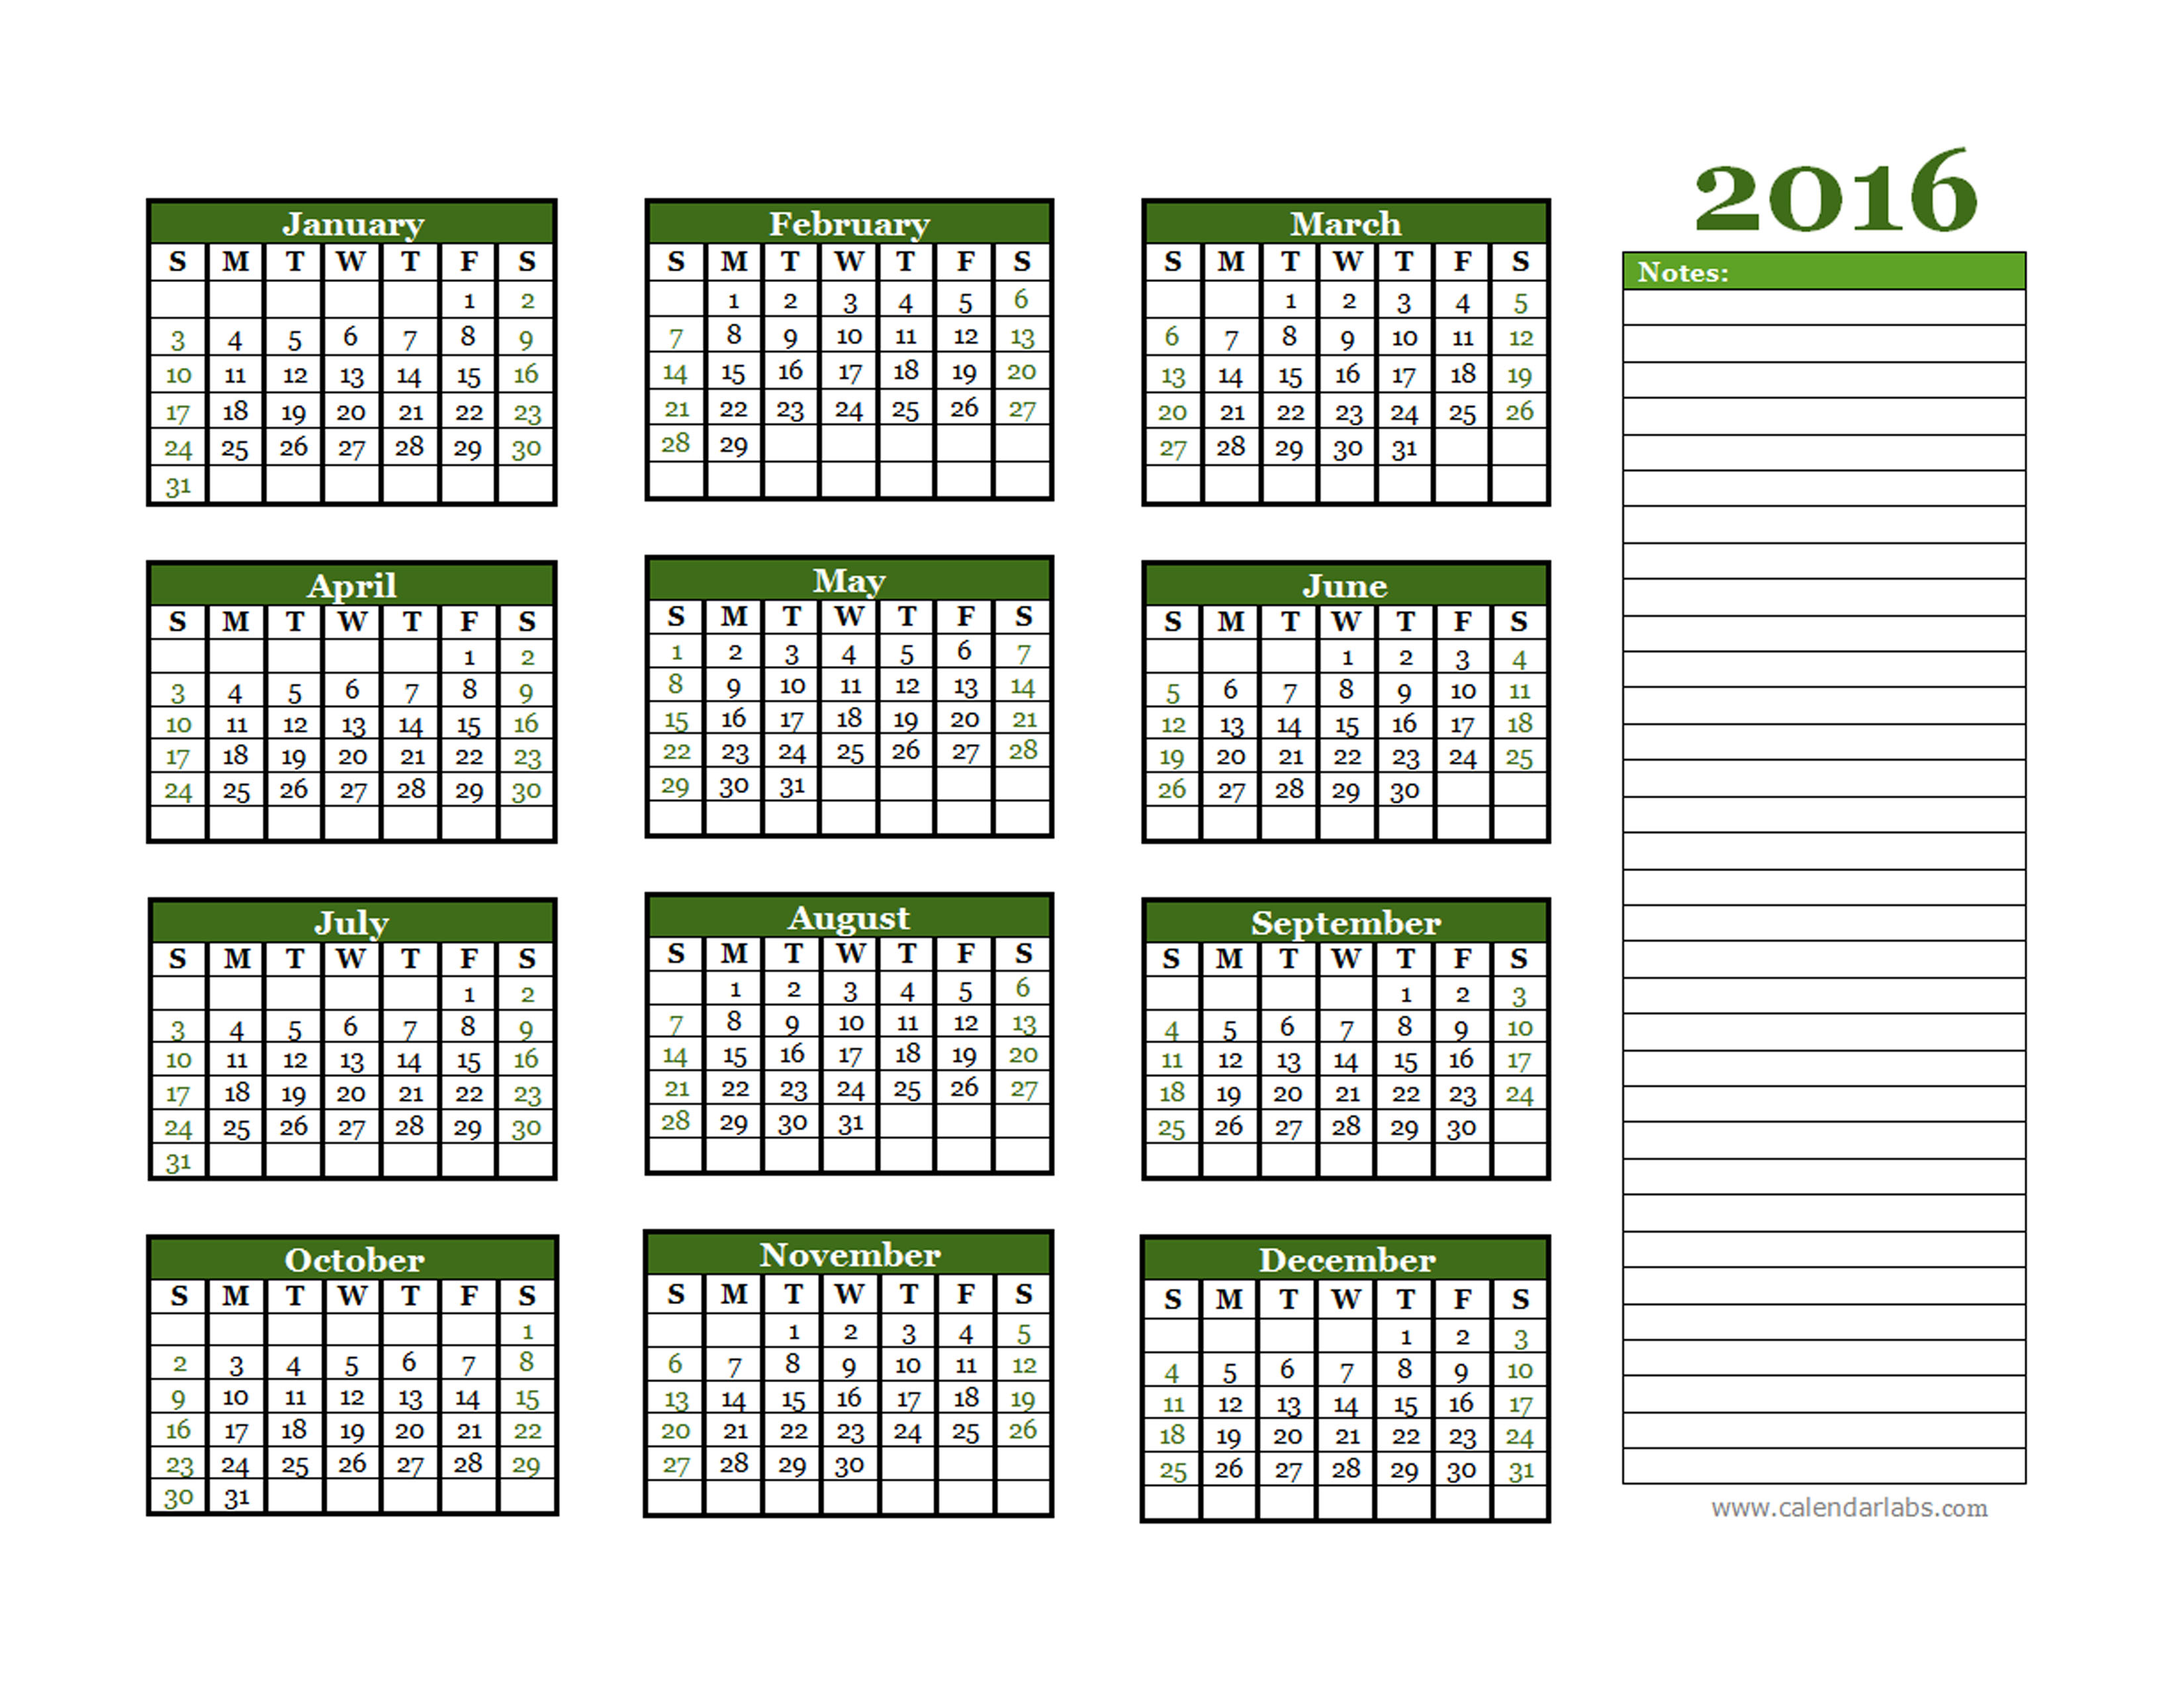 Calendar Labs For 2016 Yearly Calendar | Calendar Template 2016